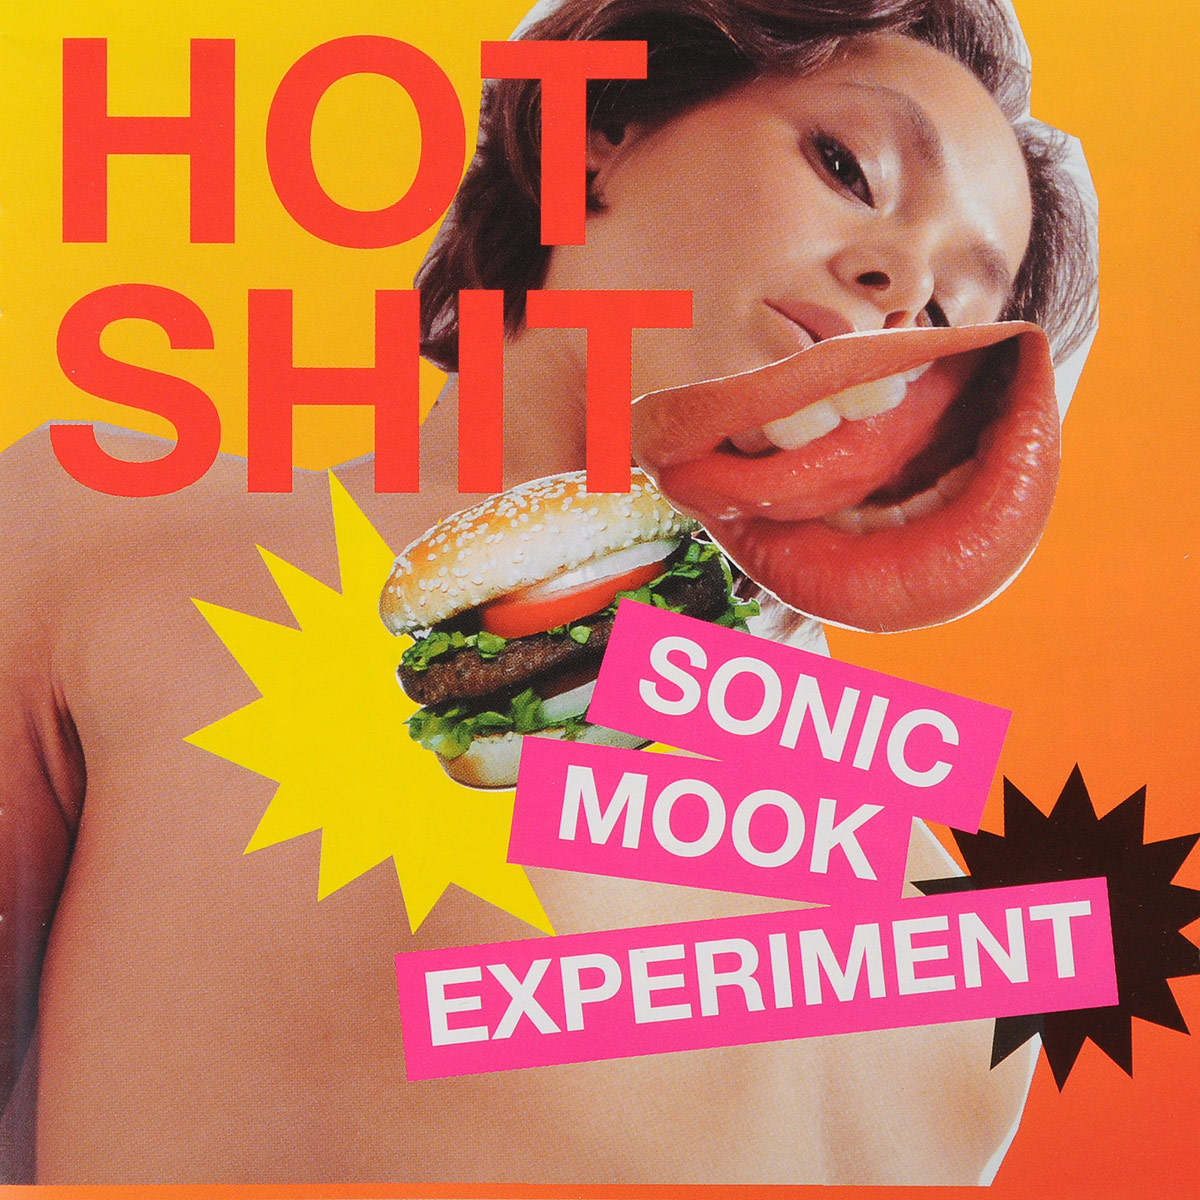 Sonic Mook 3. Hot Shit sonic mook 3 hot shit